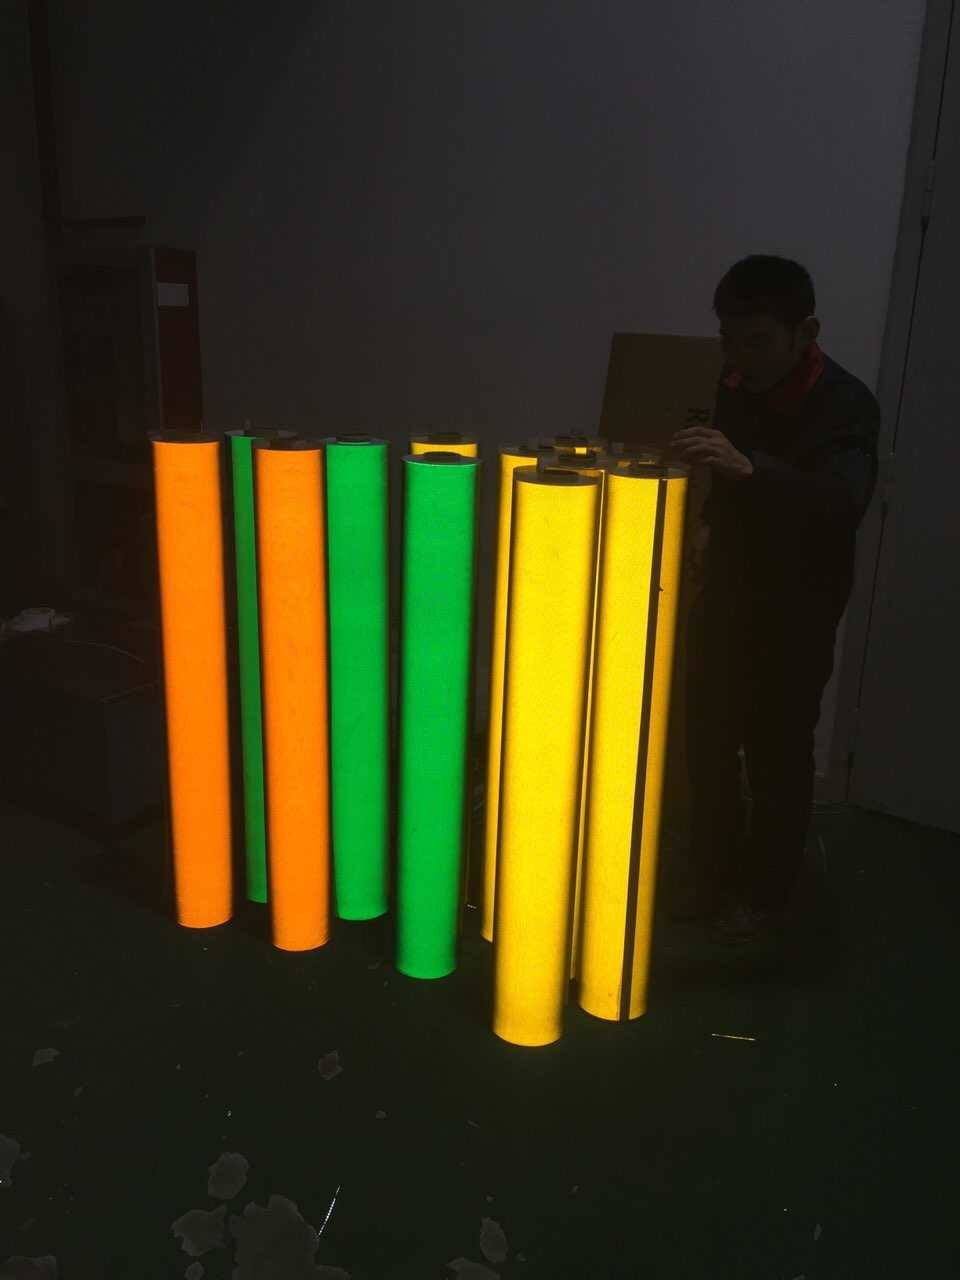 Advertisement Grade 3200 Acrylic Reflective Sheeting